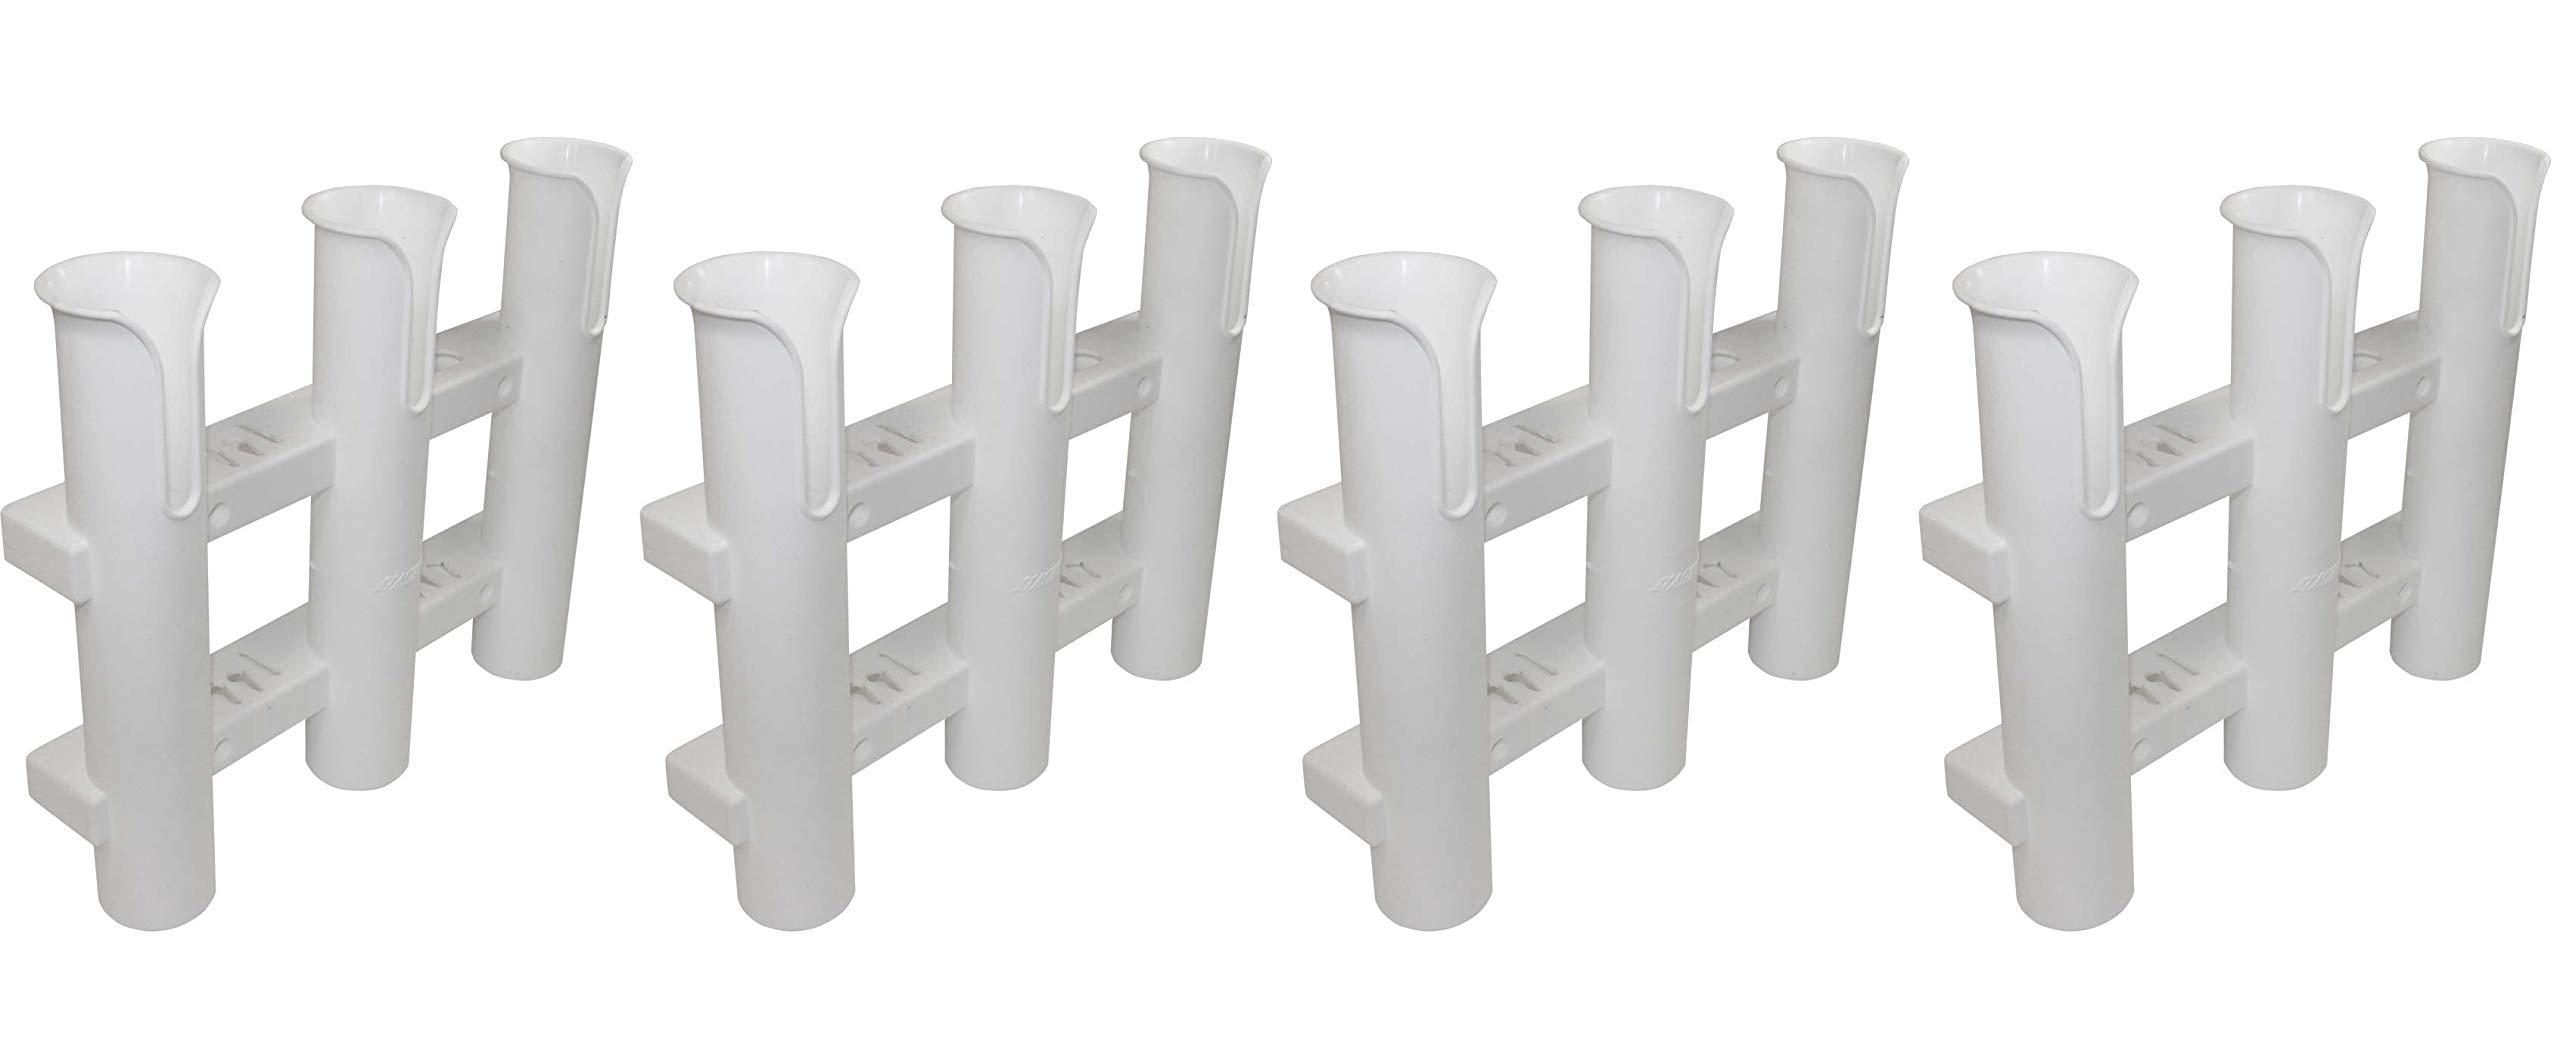 SeaSense Single Piece 3 Rack Rod Holder, White (Fоur Paсk) by SeaSense (Image #1)